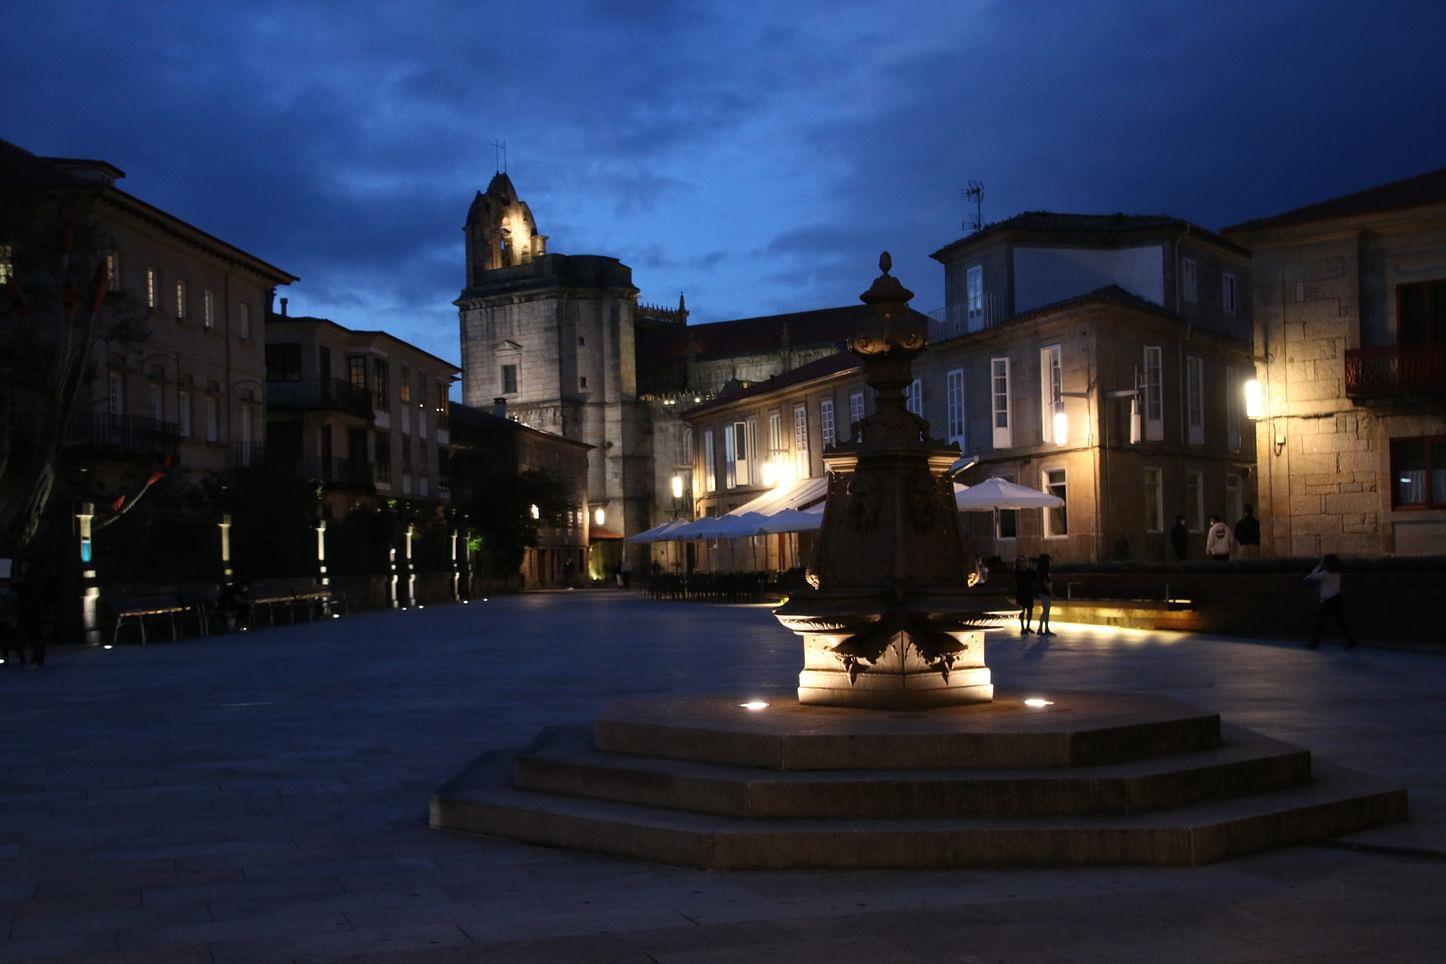 Free-Tour-Nocturno-Cristianos-y-Paganos-Pontevedra-1